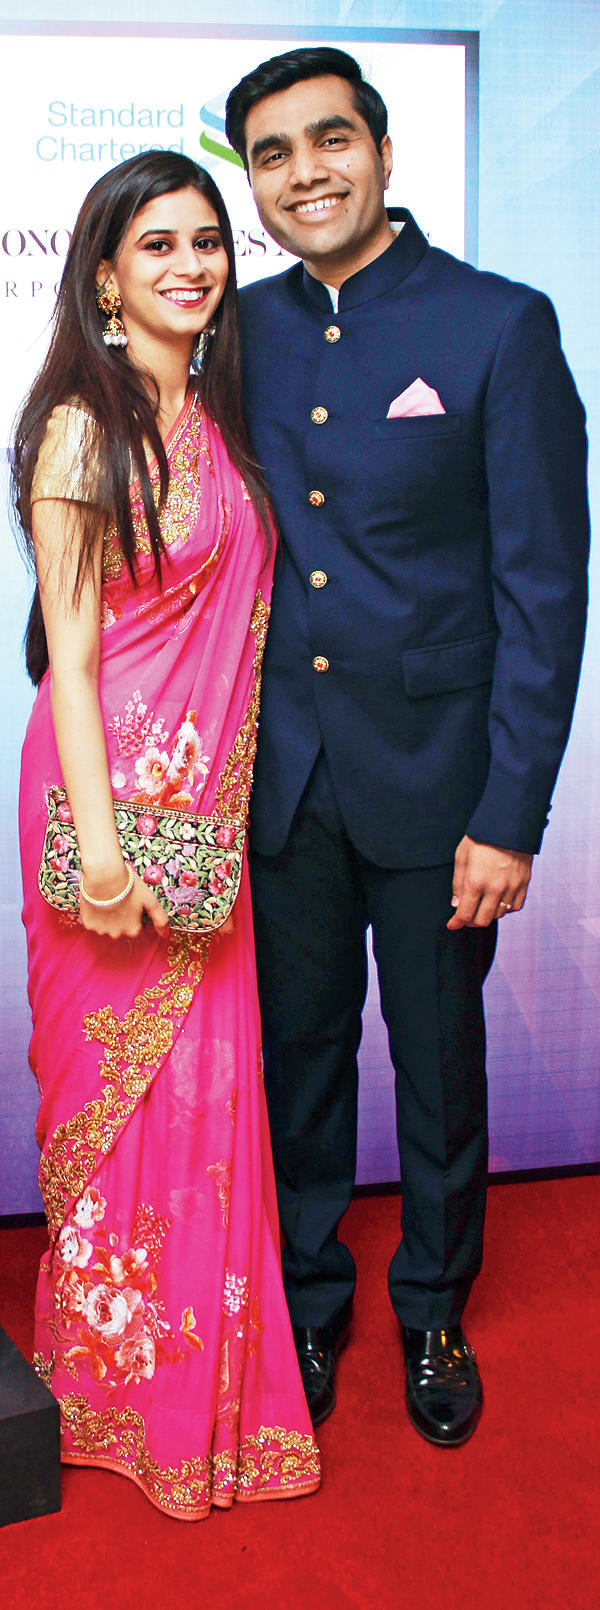 How Satya Nadella and Sajjan Jindal will ring in the new year